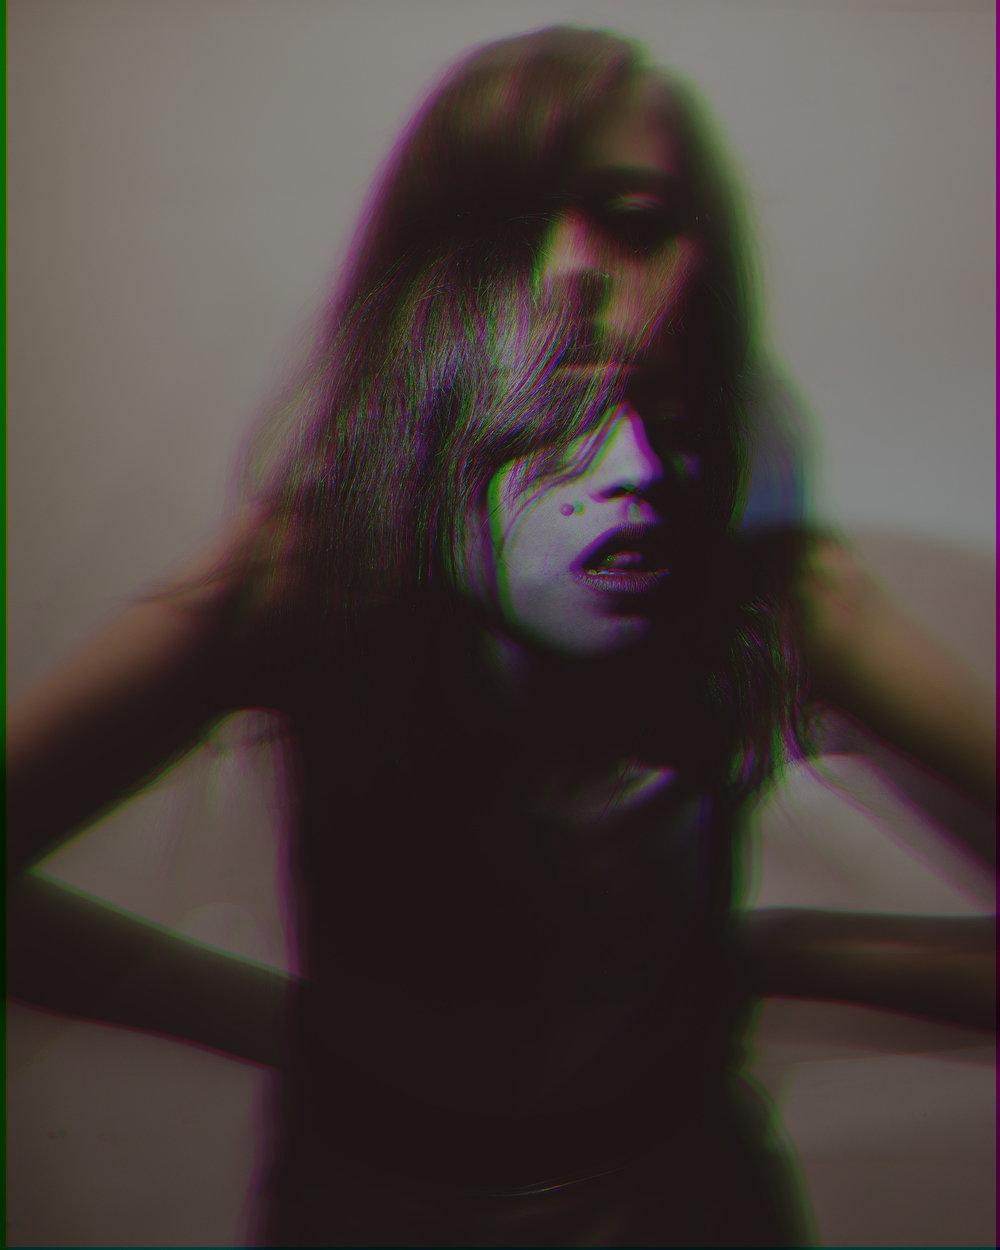 Sharon 006.jpg